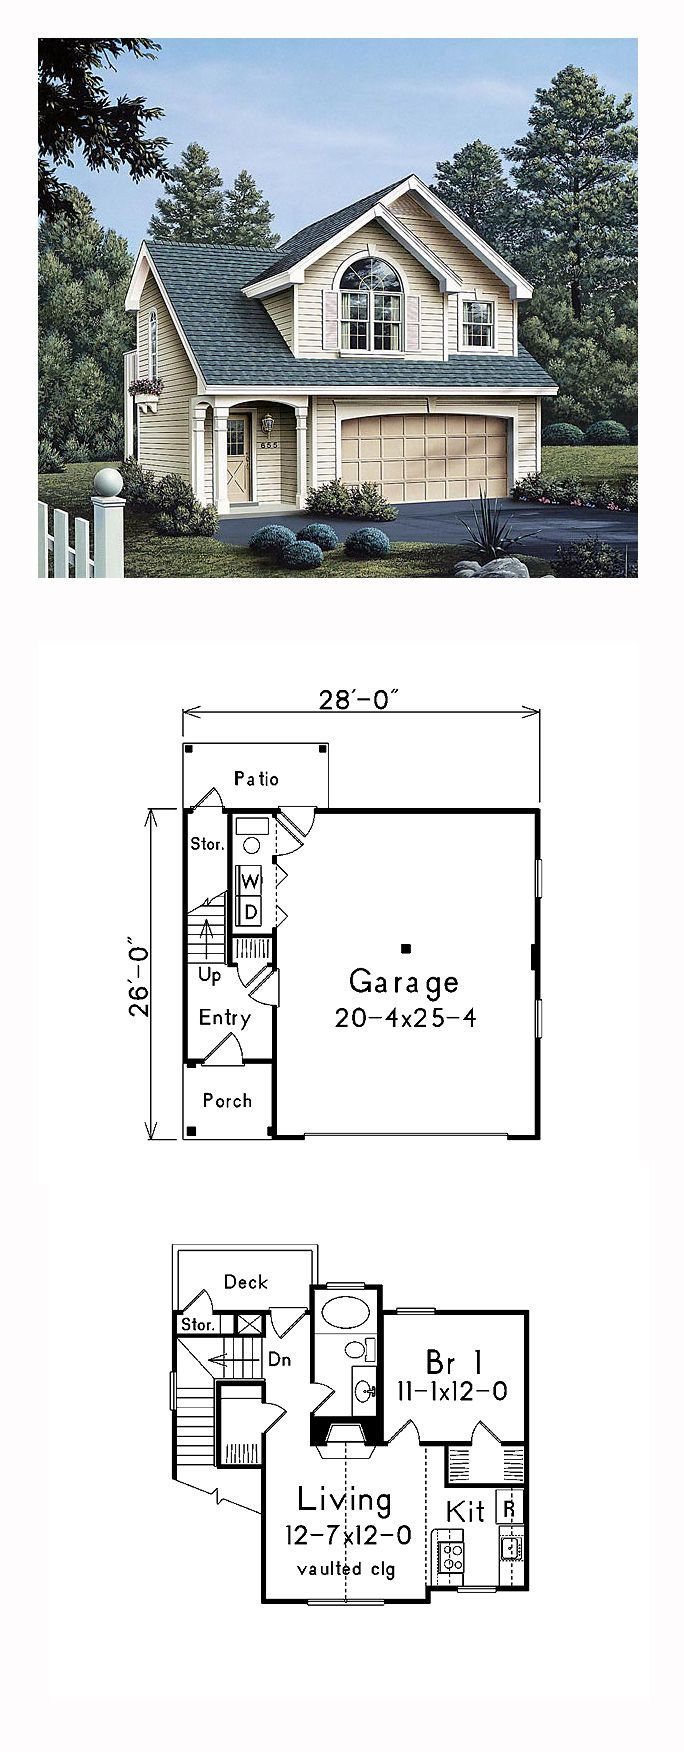 49 best garage apartment plans images on pinterest for Cool house plans garage apartment